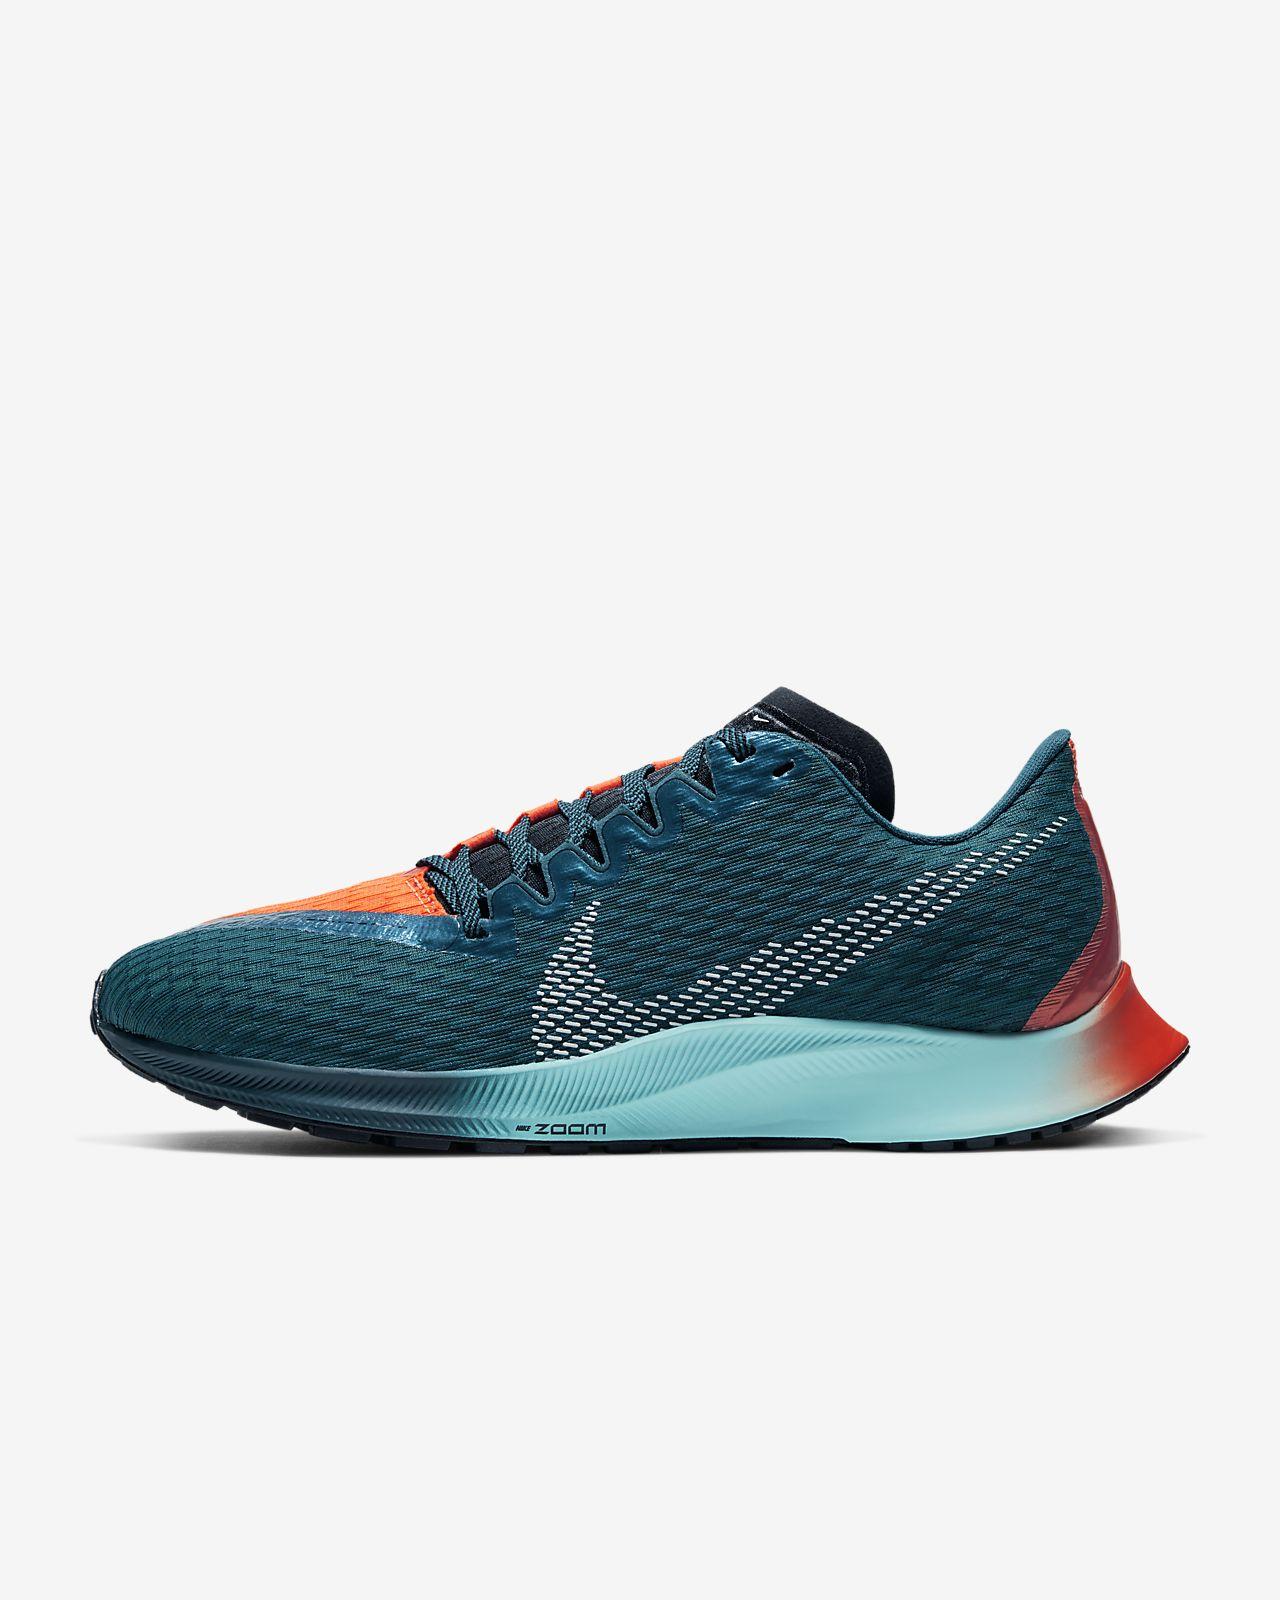 Calzado de running para mujer Nike Zoom Rival Fly 2